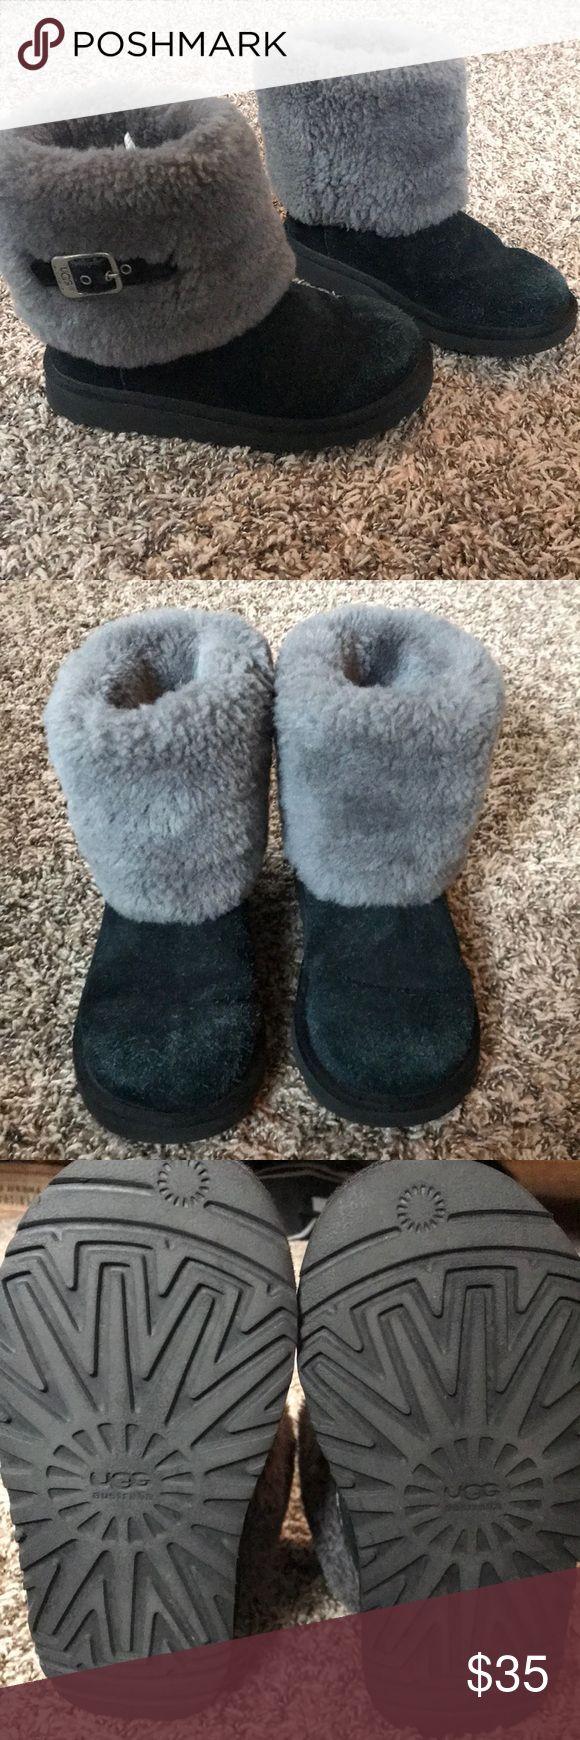 Girls Ugg boots size 2 Gently used girls black with grey Ugg boots size 2. UGG Shoes Boots